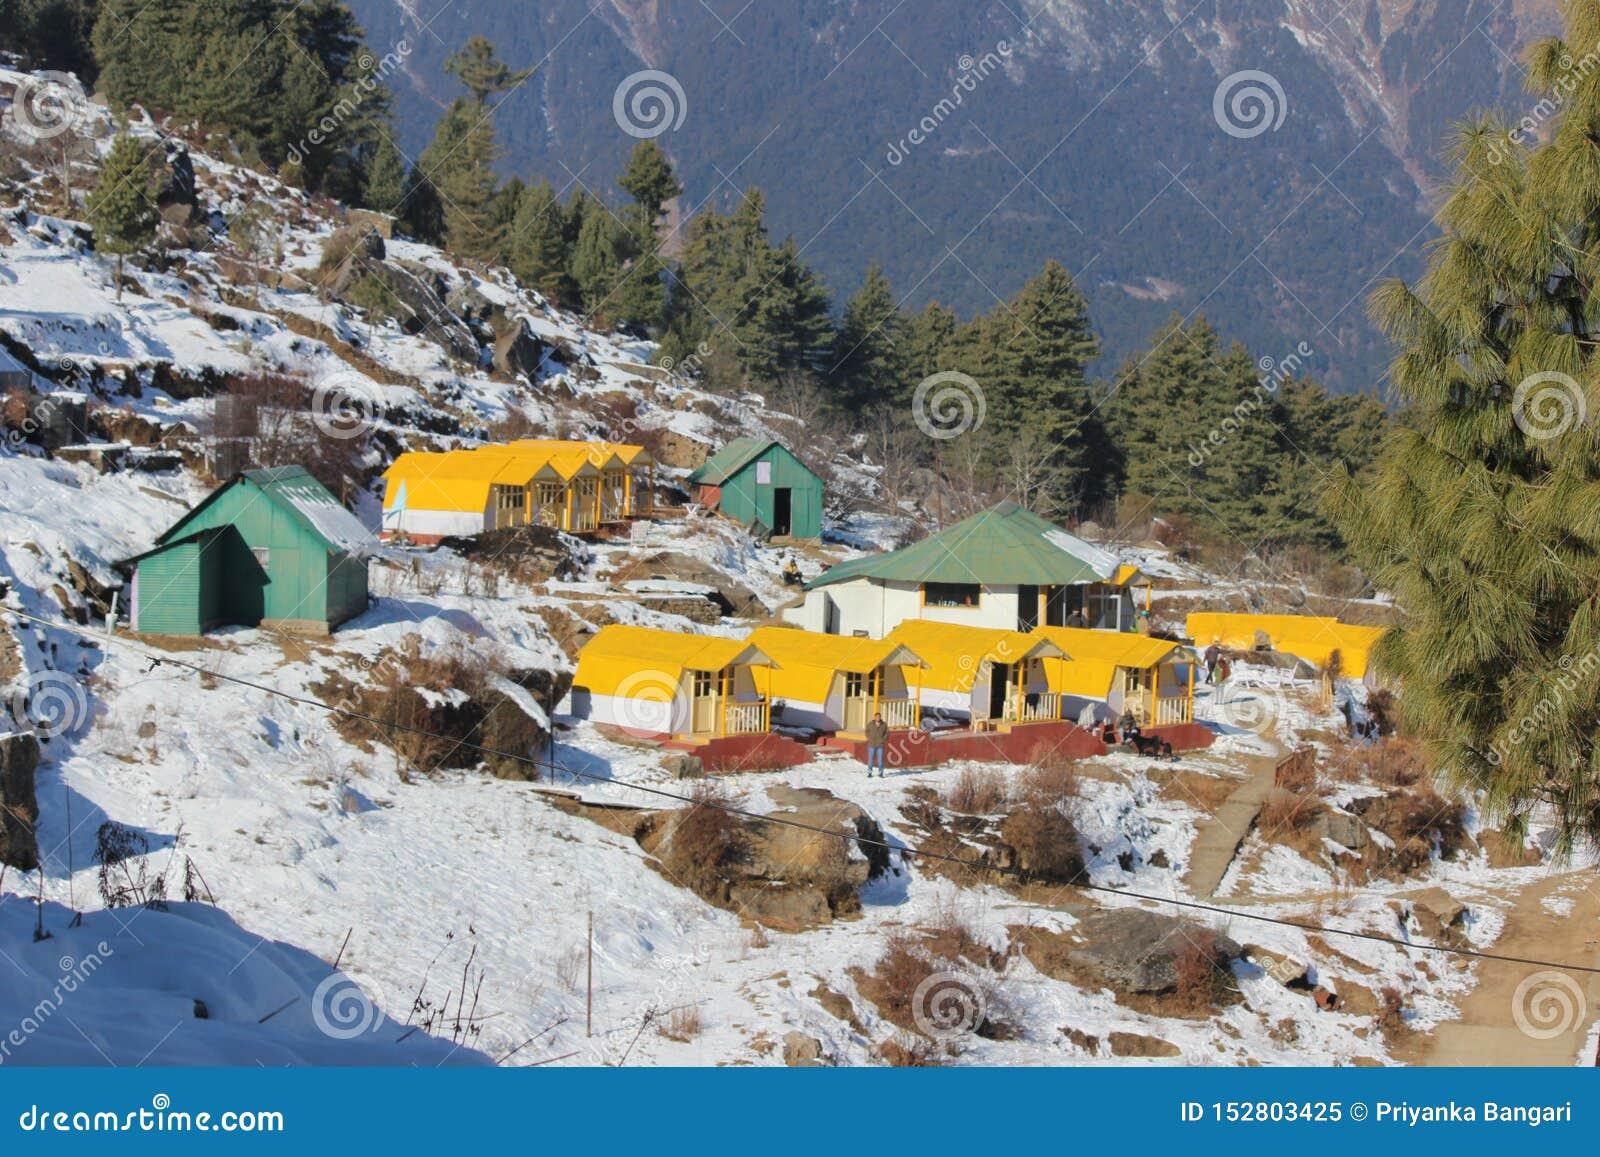 De plaats is in Uttarakhand in India geroepen AULI